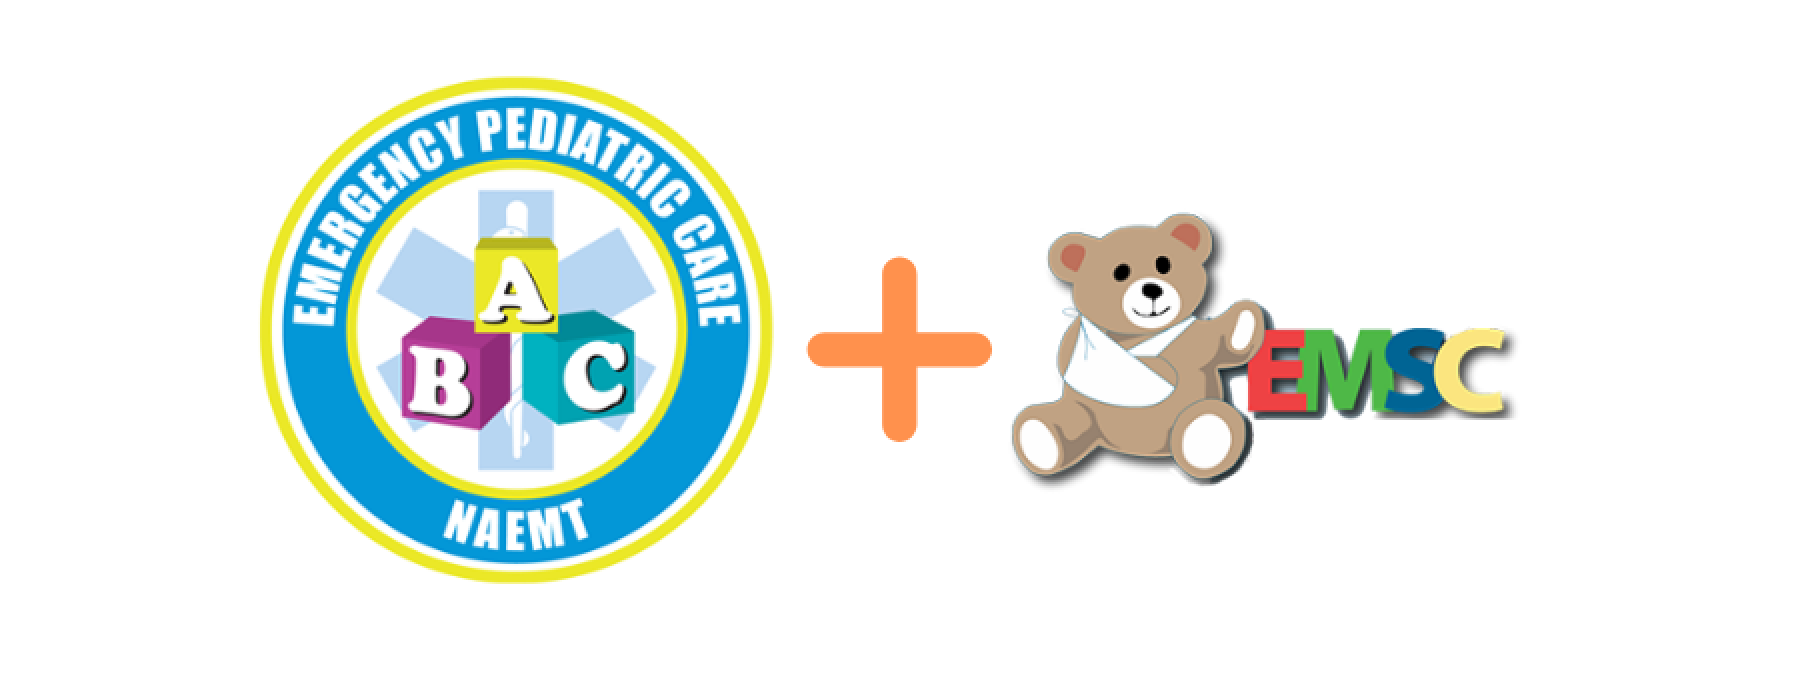 Logos Emergency Pediatric Care Epc Best Practice Medicine